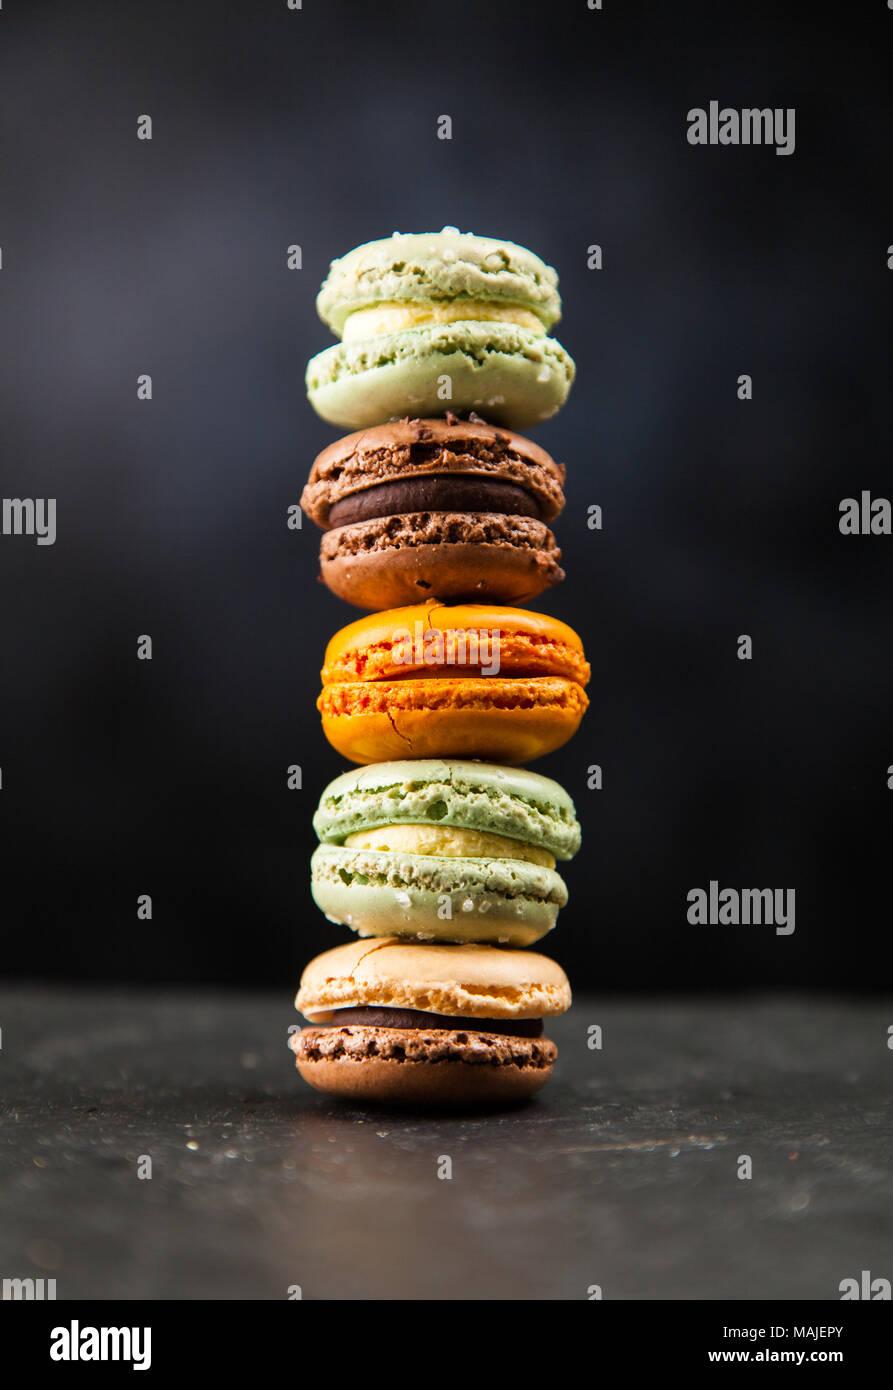 Assortment of macaron cookies - Stock Image